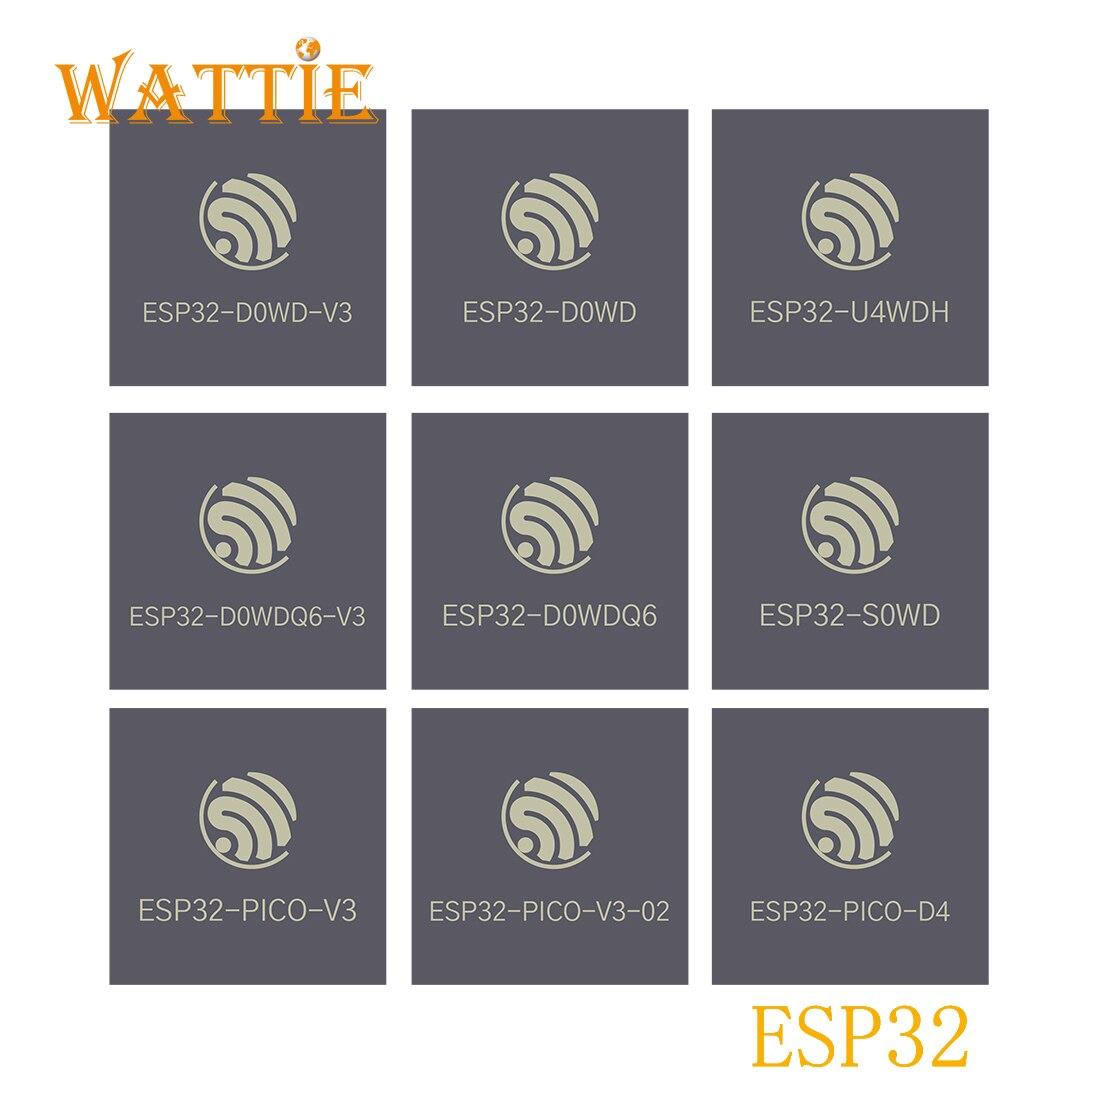 5pcs ESP32-D0WDQ6 ESP32-D0WDQ6-V3 ESP32-D0WD ESP32-D0WD-V3 ESP32-PICO-V3 ESP32-PICO-V3 02 ESP32-PICO-D4 ESP32-U4WDH ESP32-S0WD